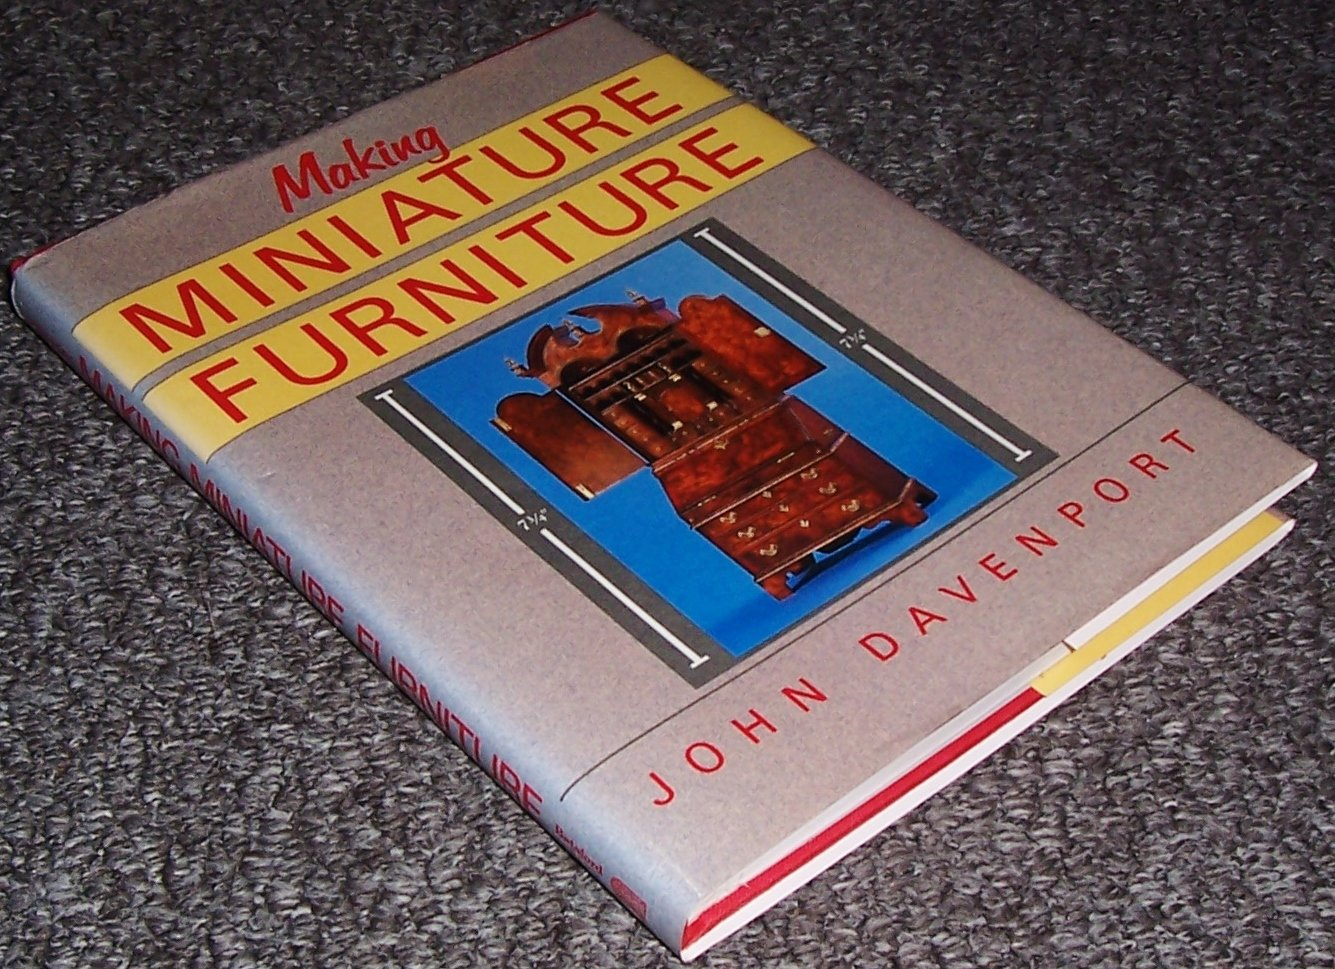 Making Miniature Furniture (Design & construction)